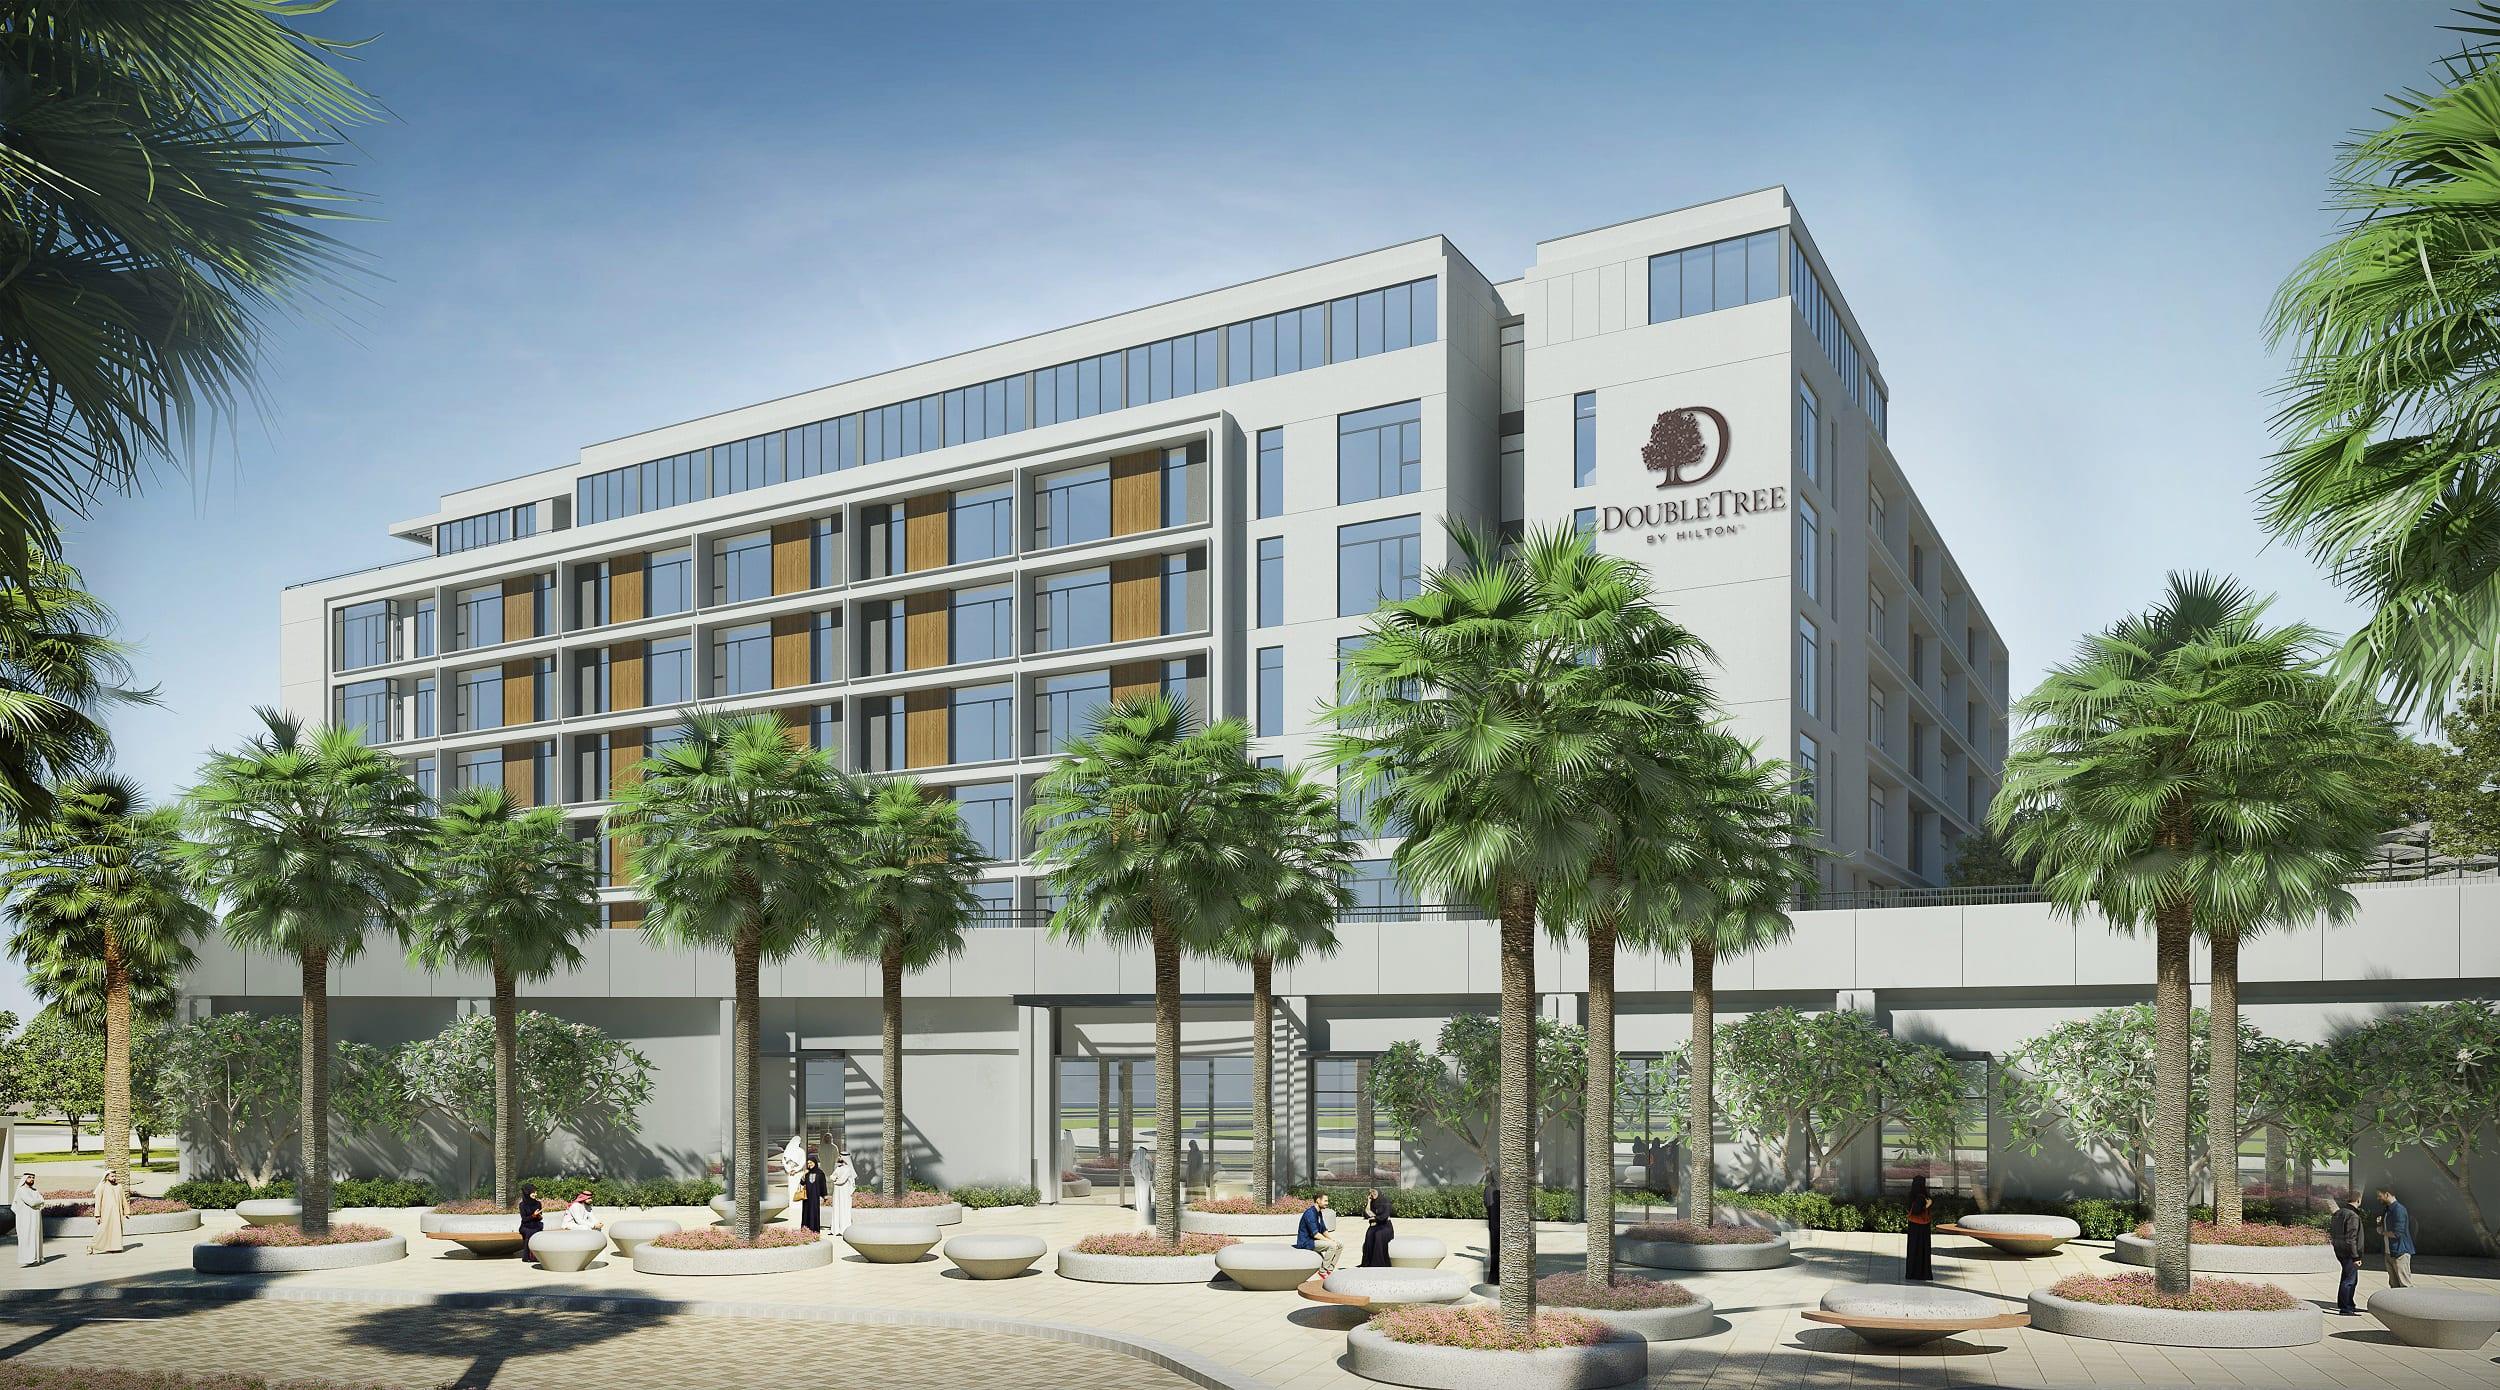 Hilton signs to bring Curio brand to Yas Island in Abu Dhabi